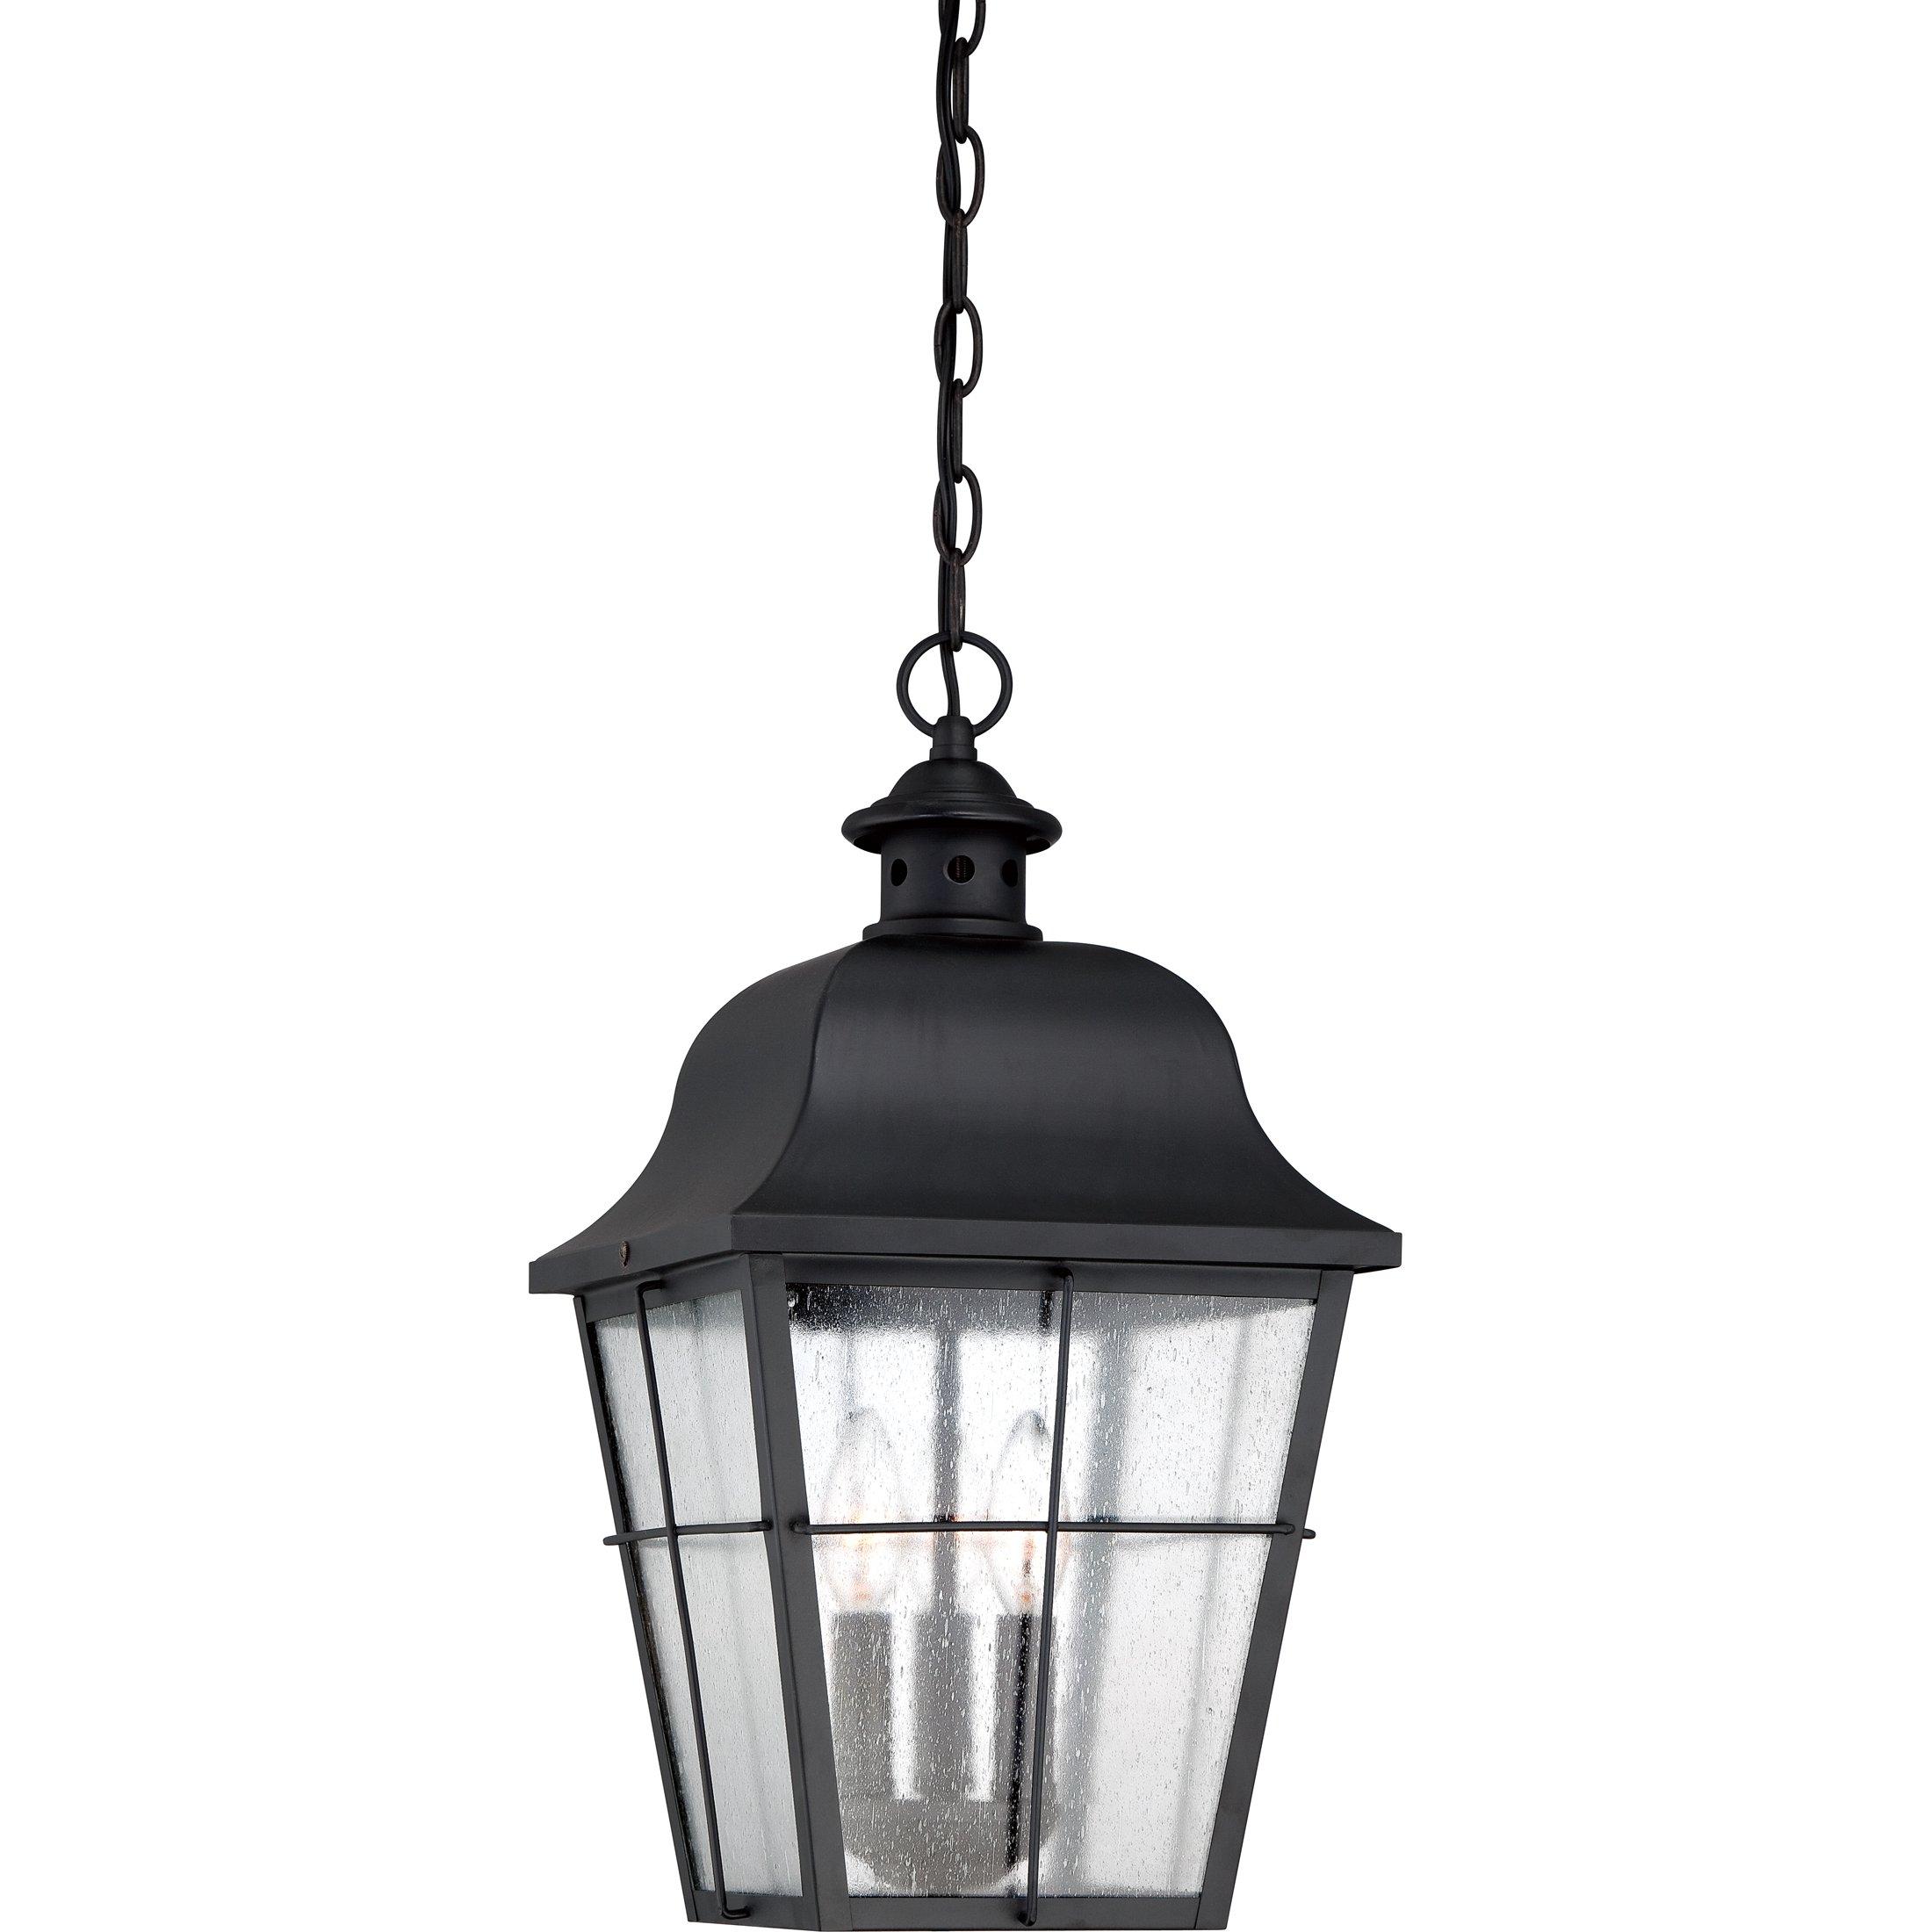 Quoizel MHE1910K 3-Light Millhouse Outdoor Lantern in Mystic Black